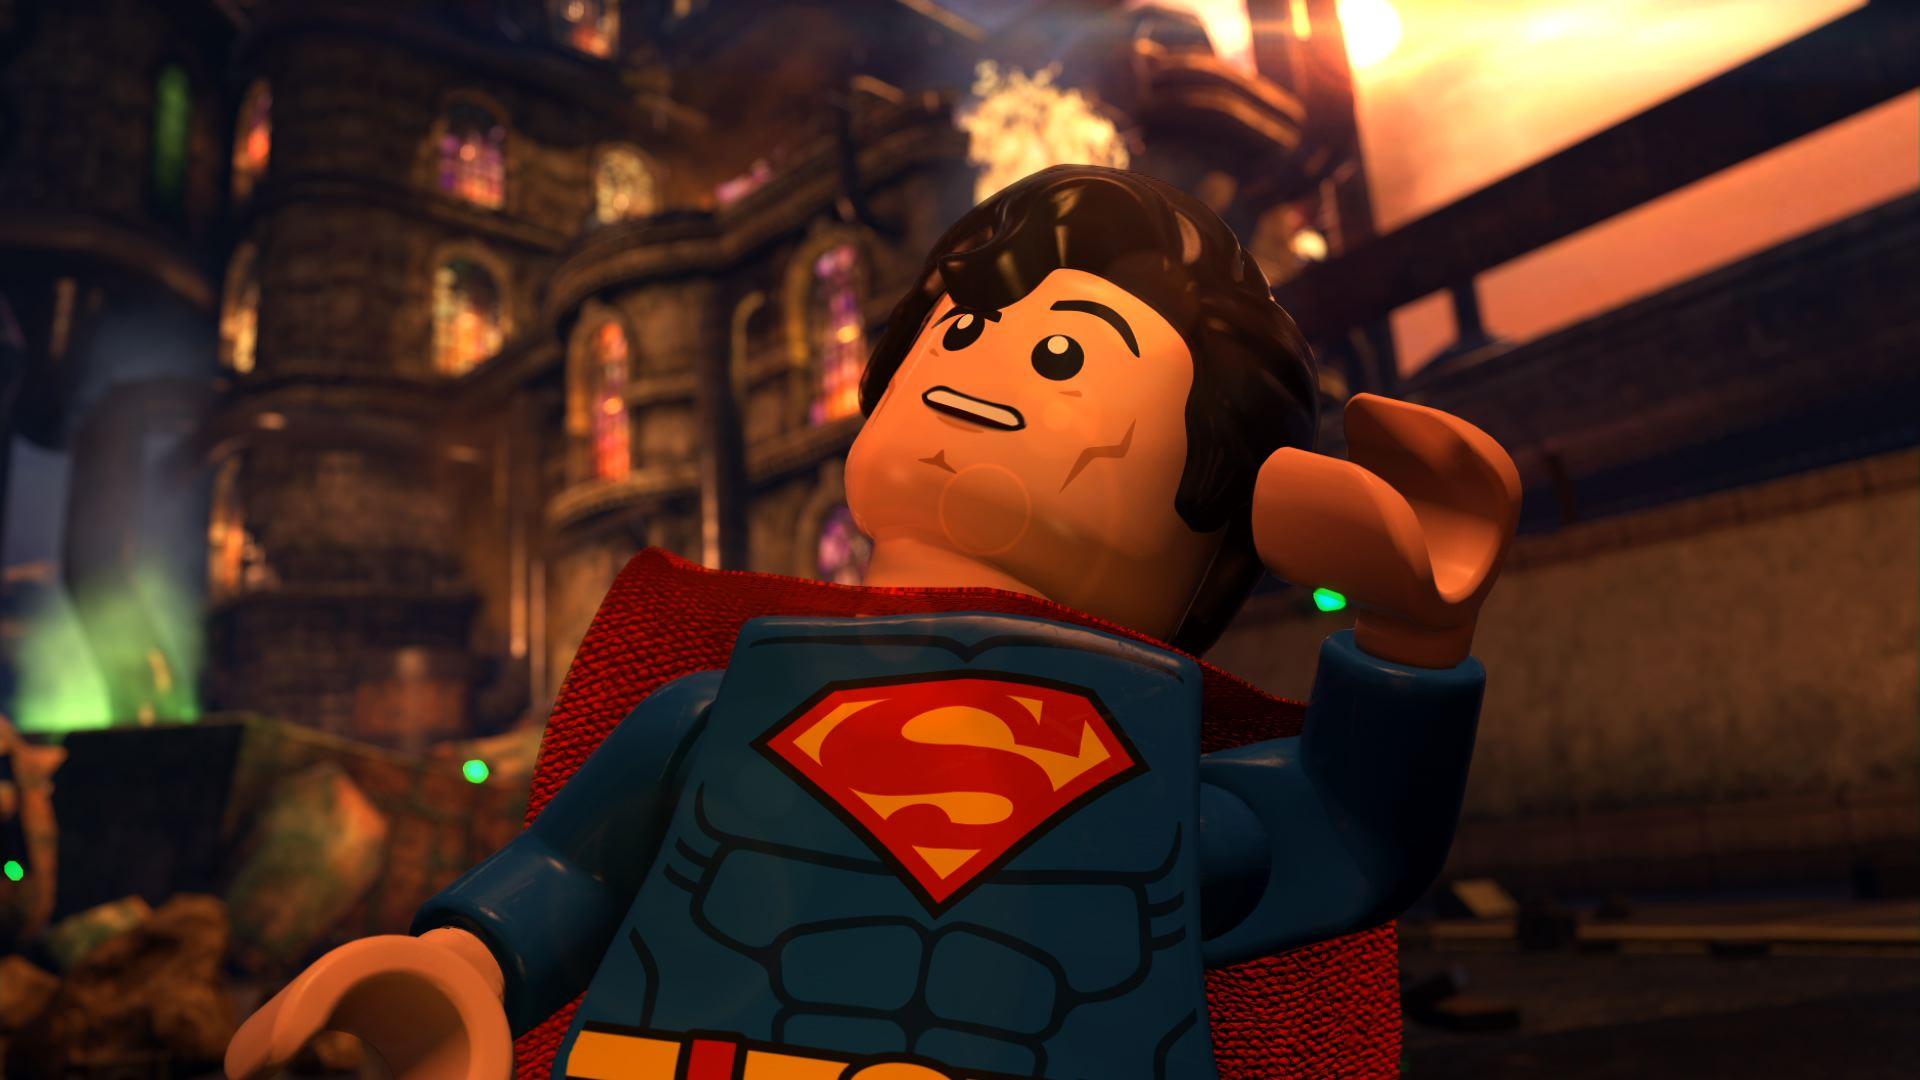 Lego Batman The Movie Dc Superheroes Unite Wallpaper - Lego Batman O Filme Superman , HD Wallpaper & Backgrounds